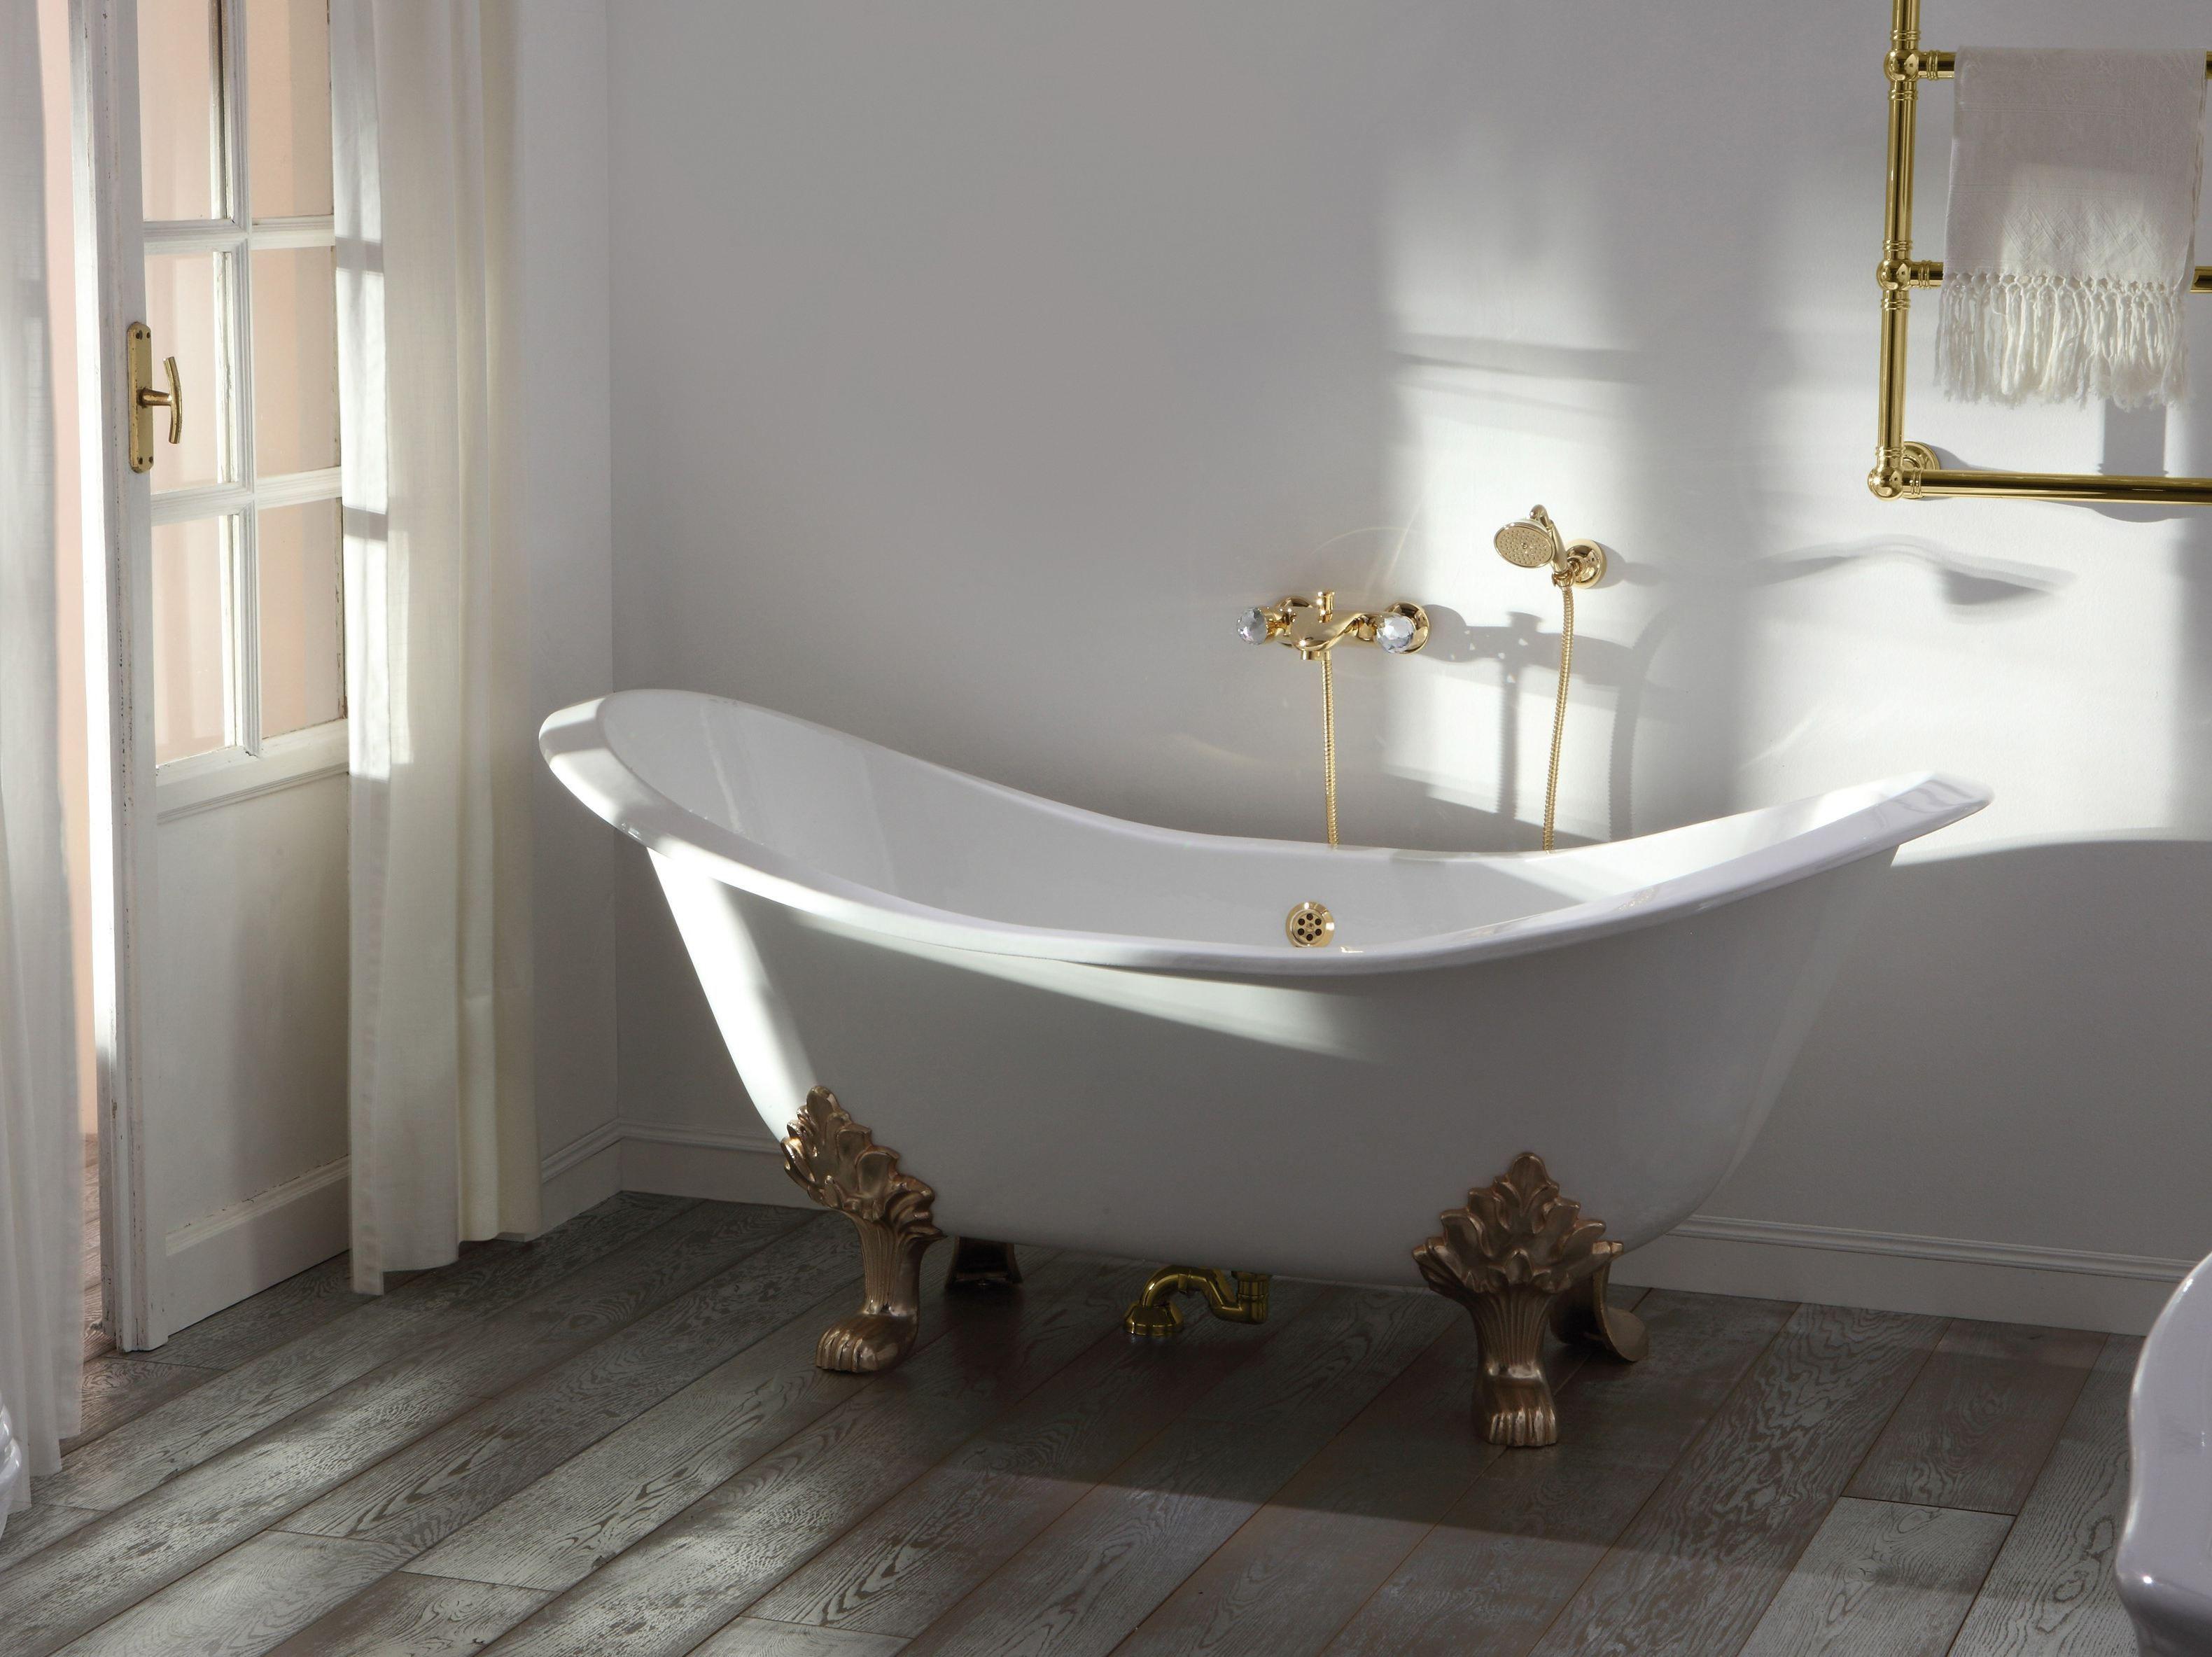 Vasca Da Bagno Stile Inglese : Vasca da bagno in inglese idee per la casa douglasfalls.com